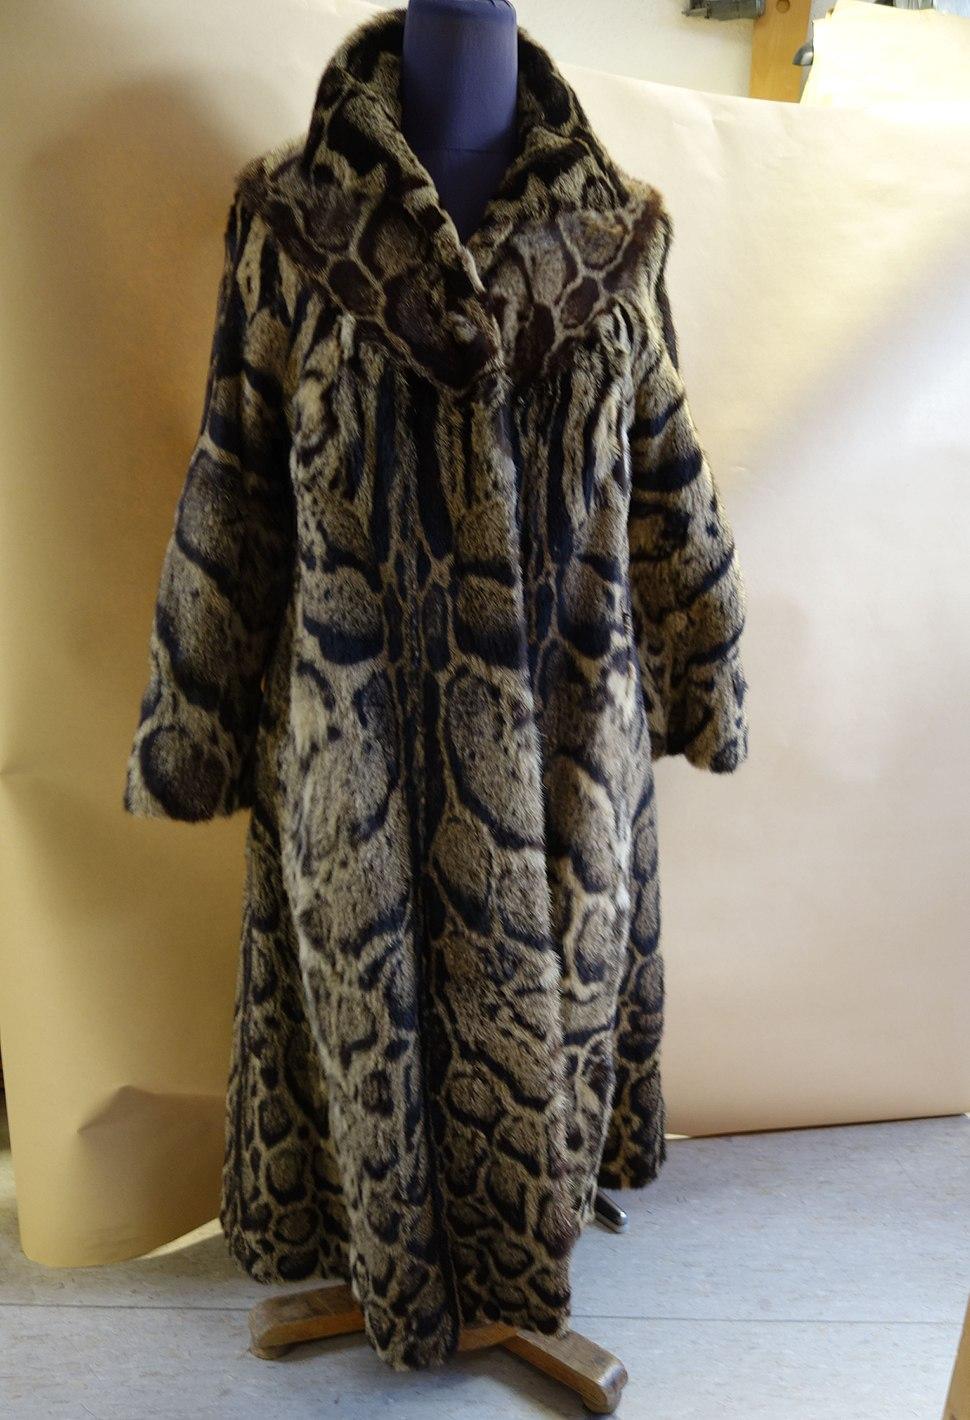 Clouded leopard coat (1)